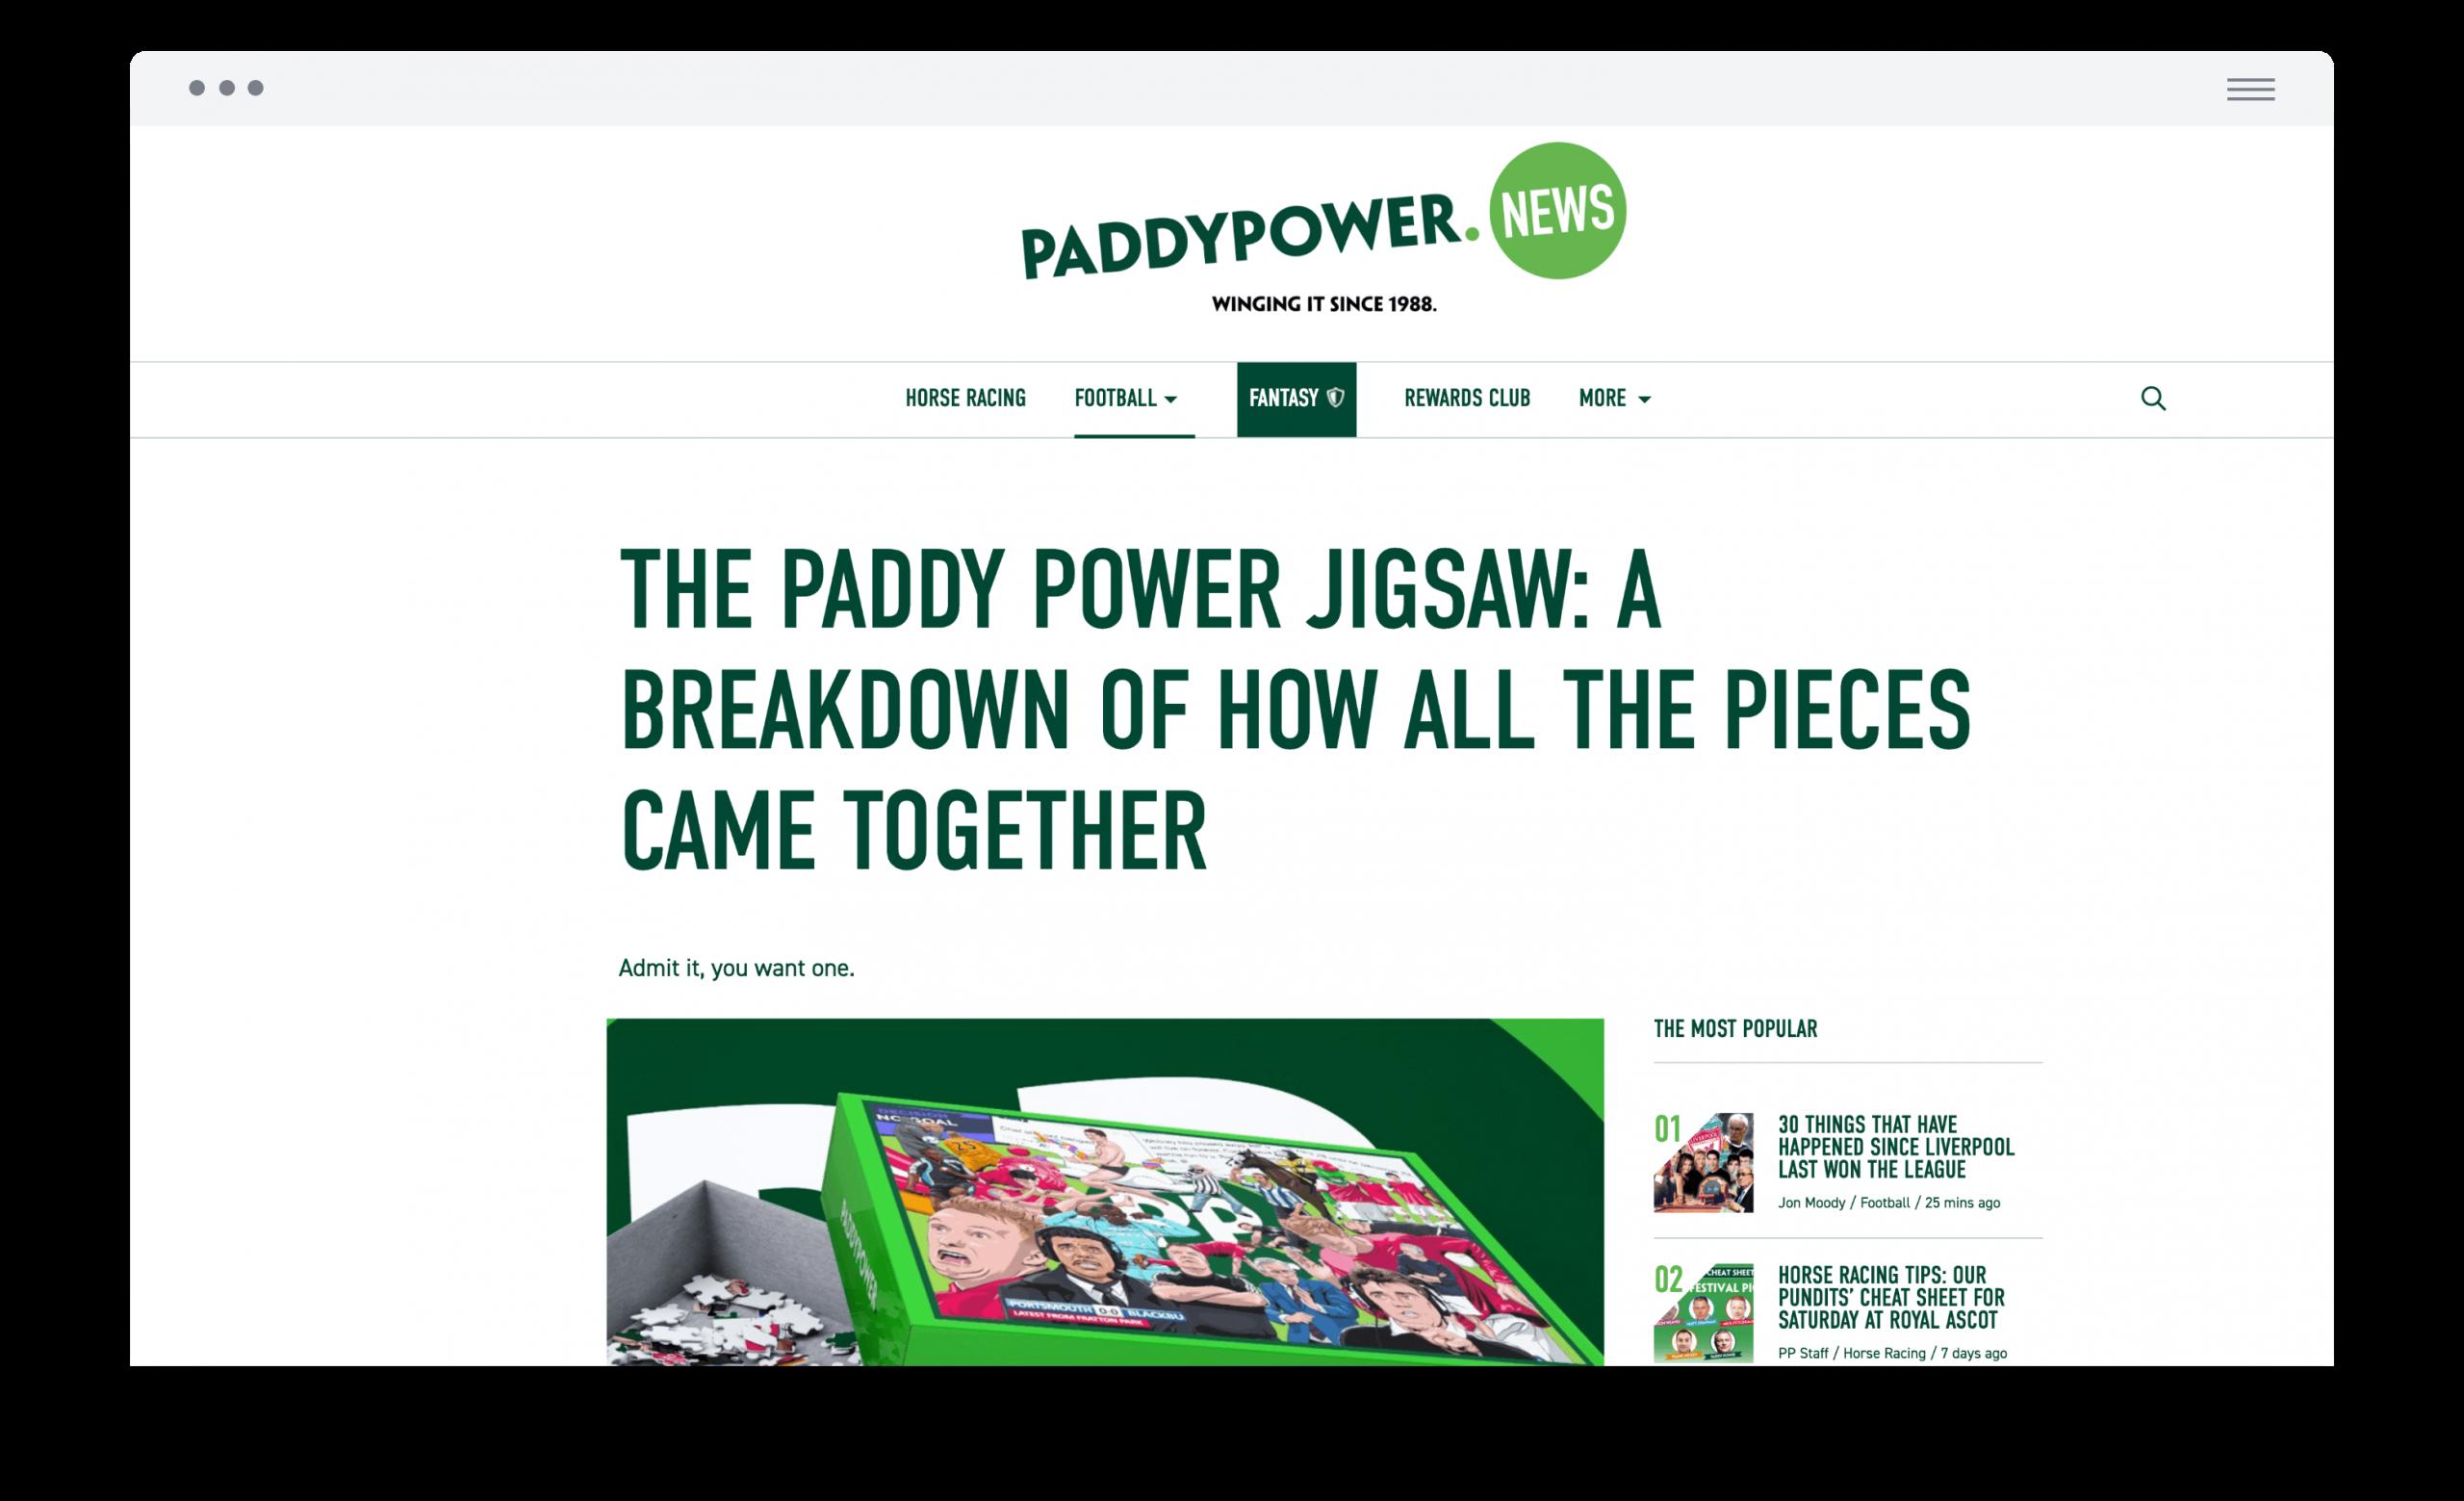 Paddy Power jigsaw news article